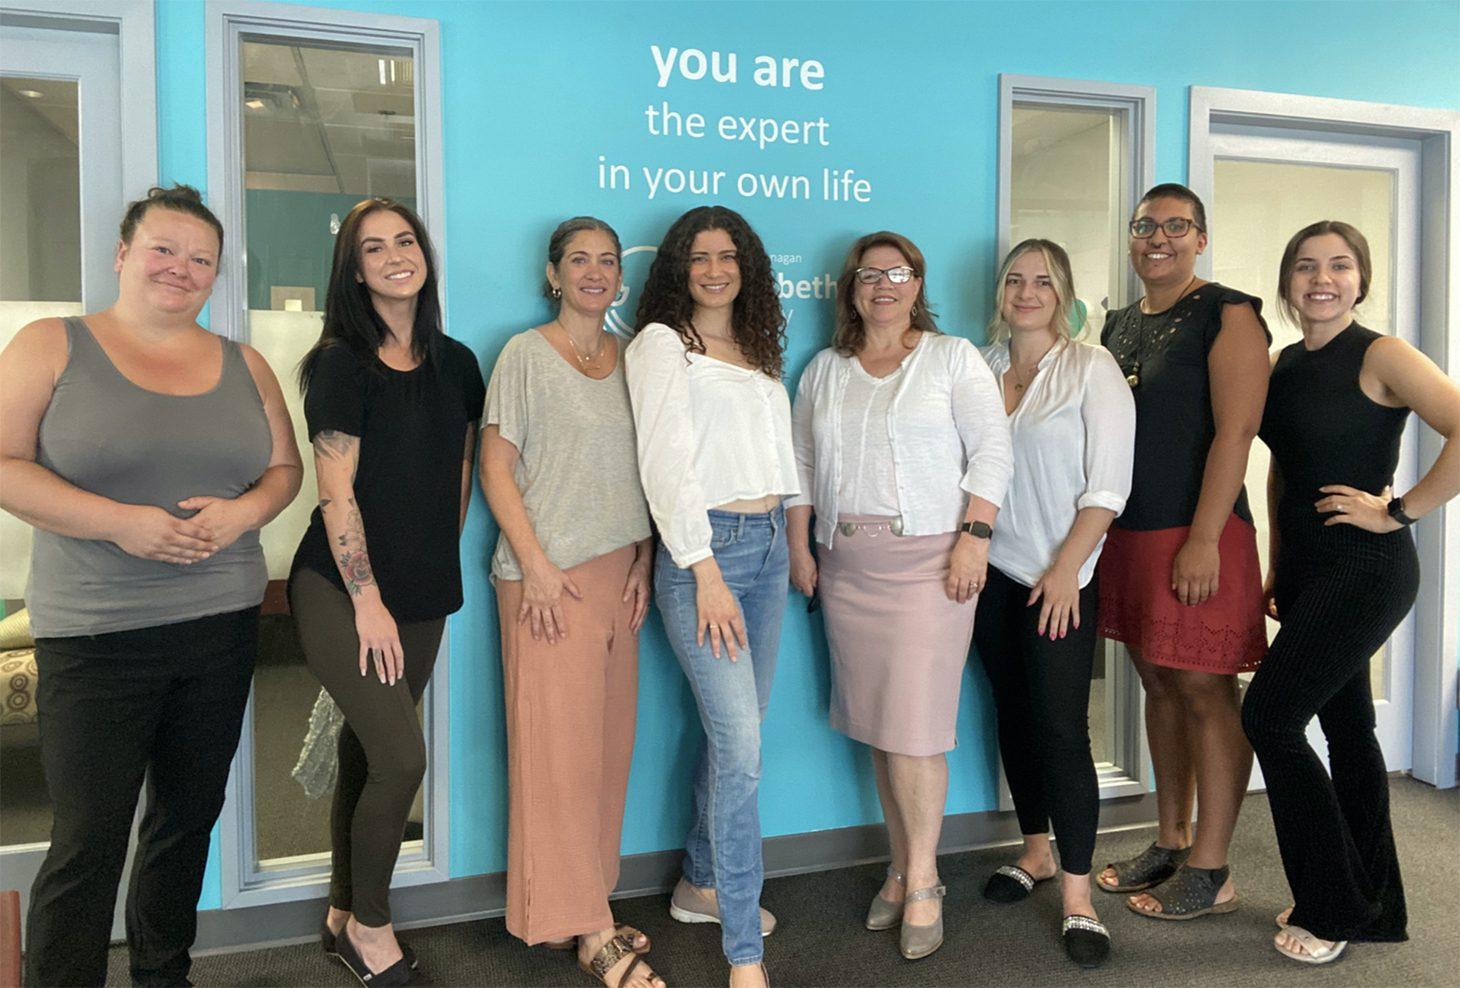 The Elizabeth Fry Society, an organization providing services to gender-based violence survivors